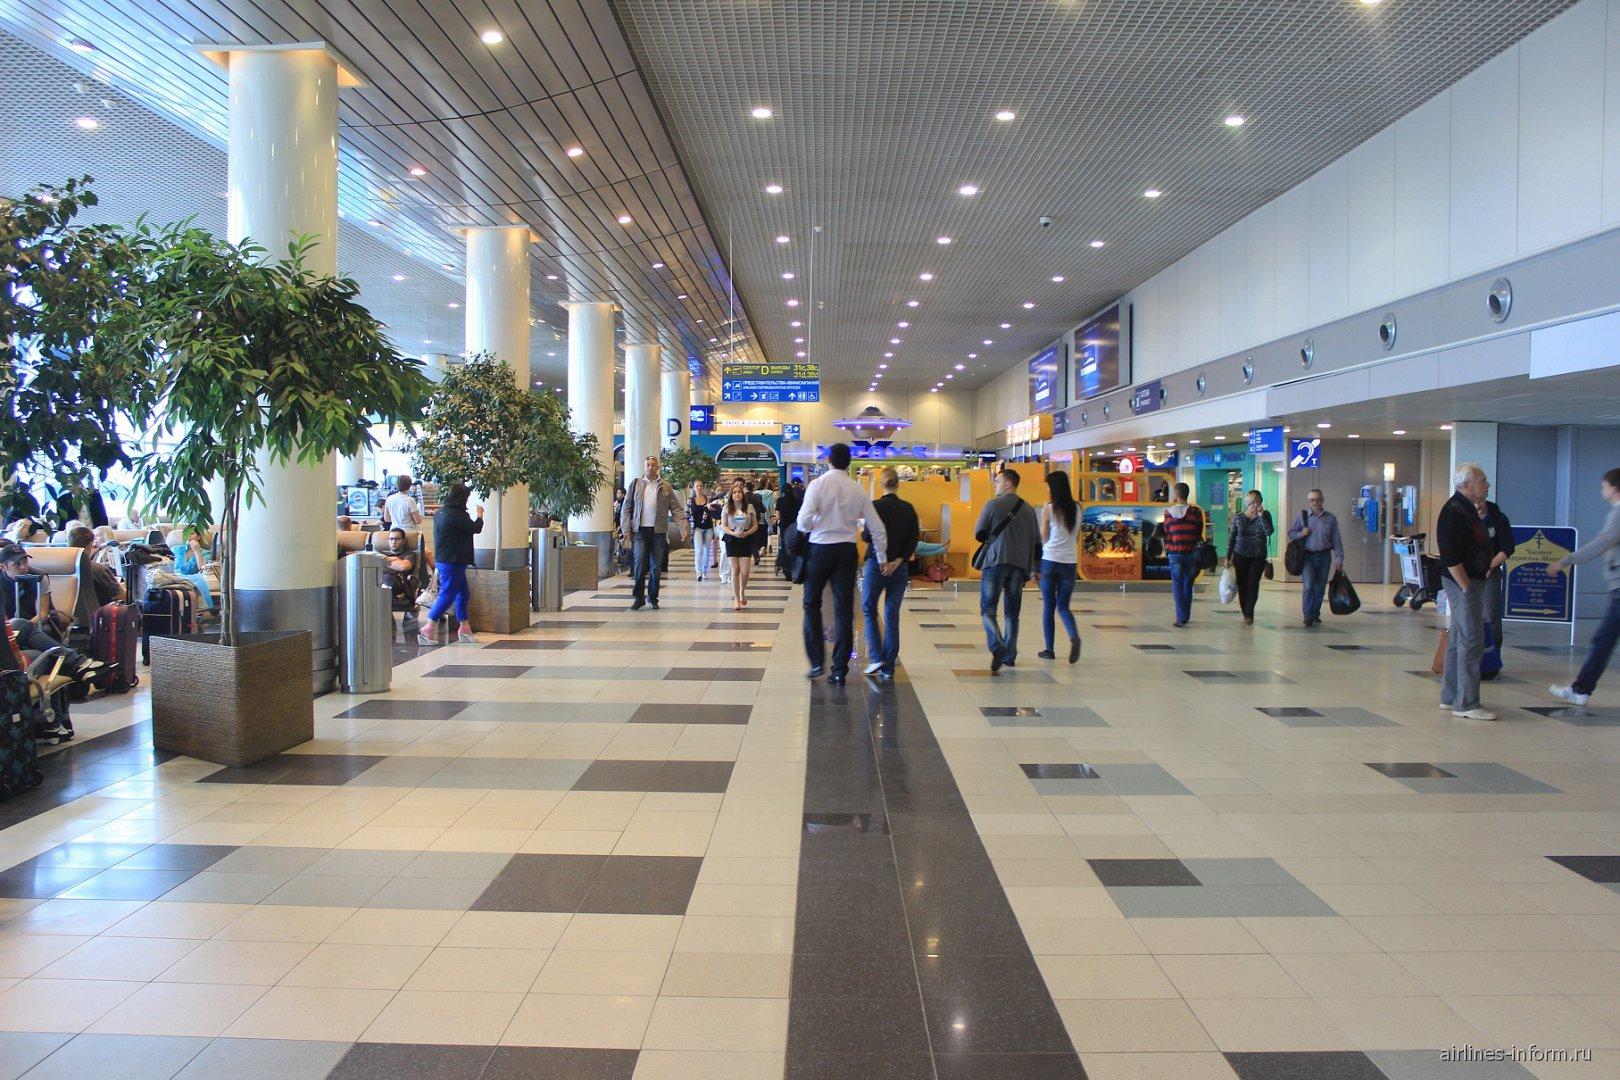 На 2-м этажа аэровокзала аэропорта Домодедово